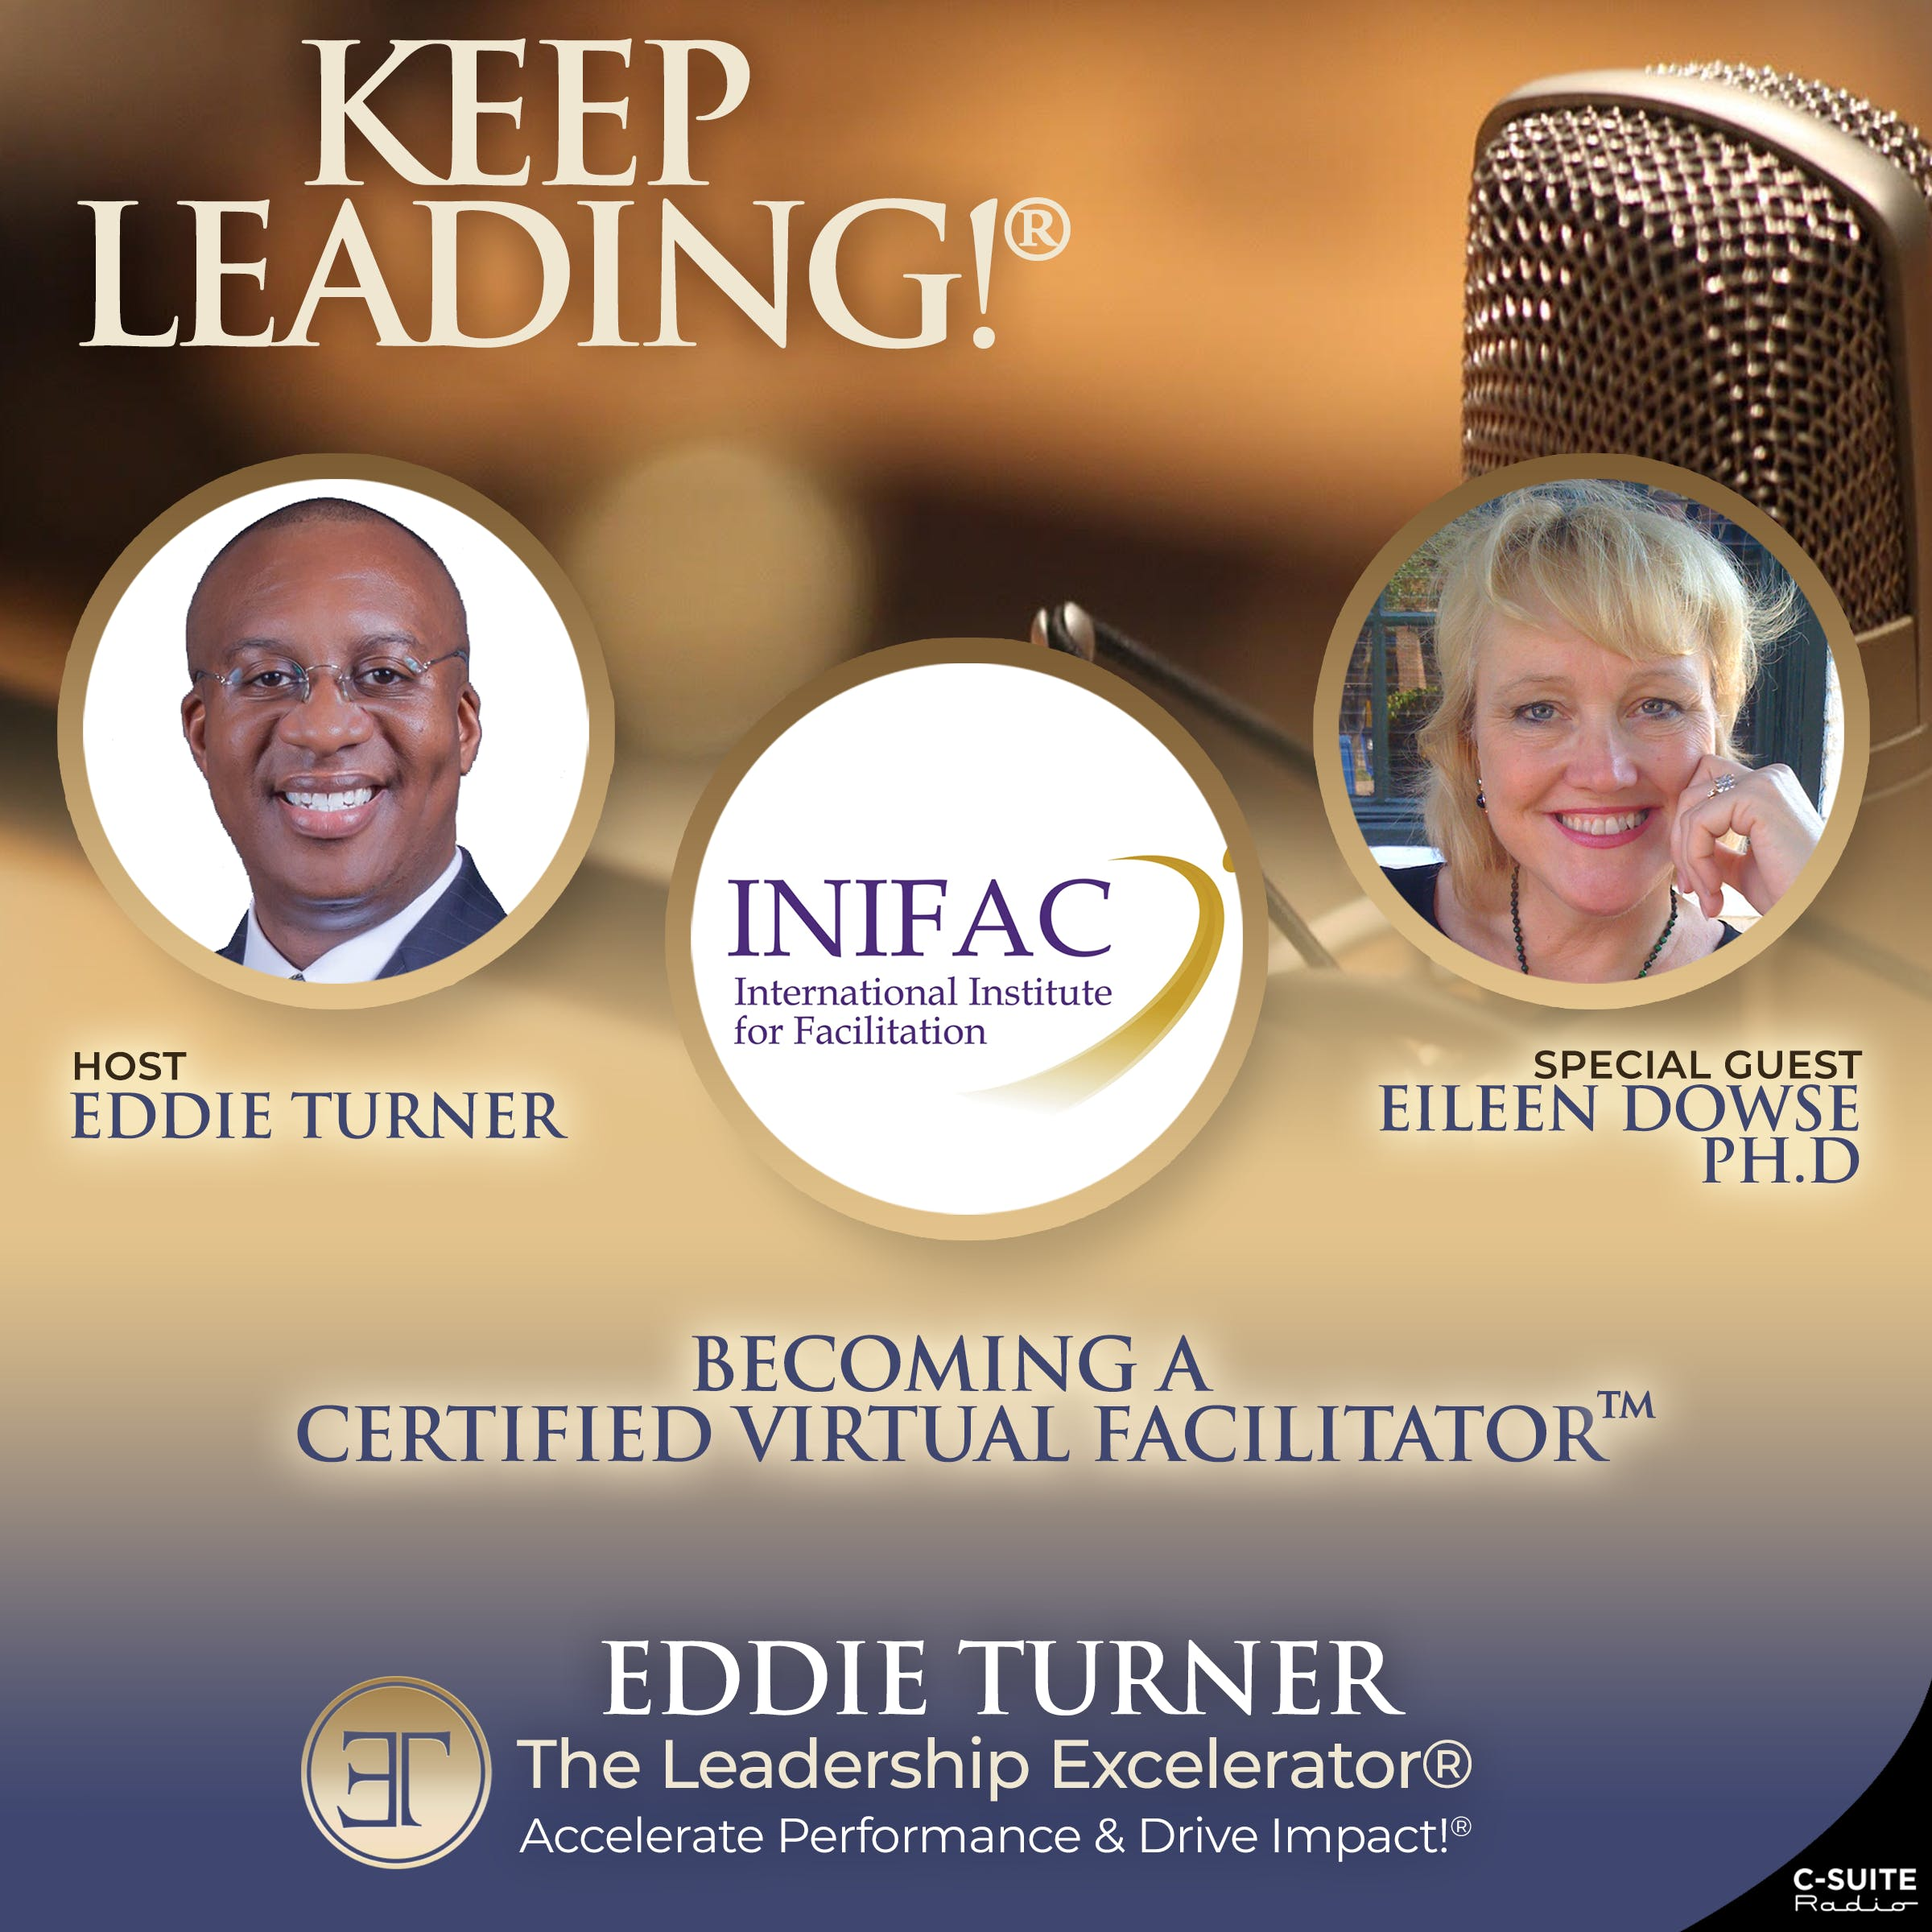 Becoming a Certified Virtual Facilitator™